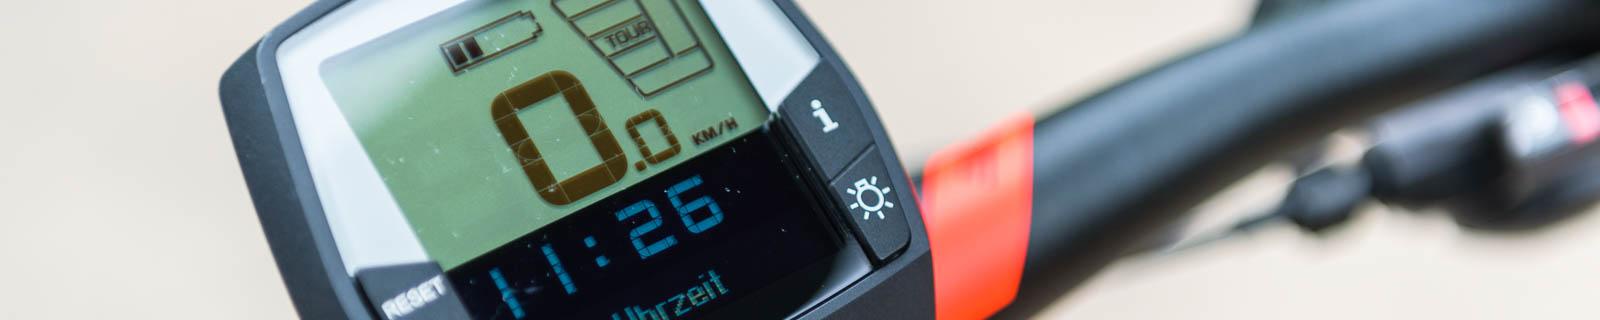 Cube E-Bike Cross- und Fitnessräder